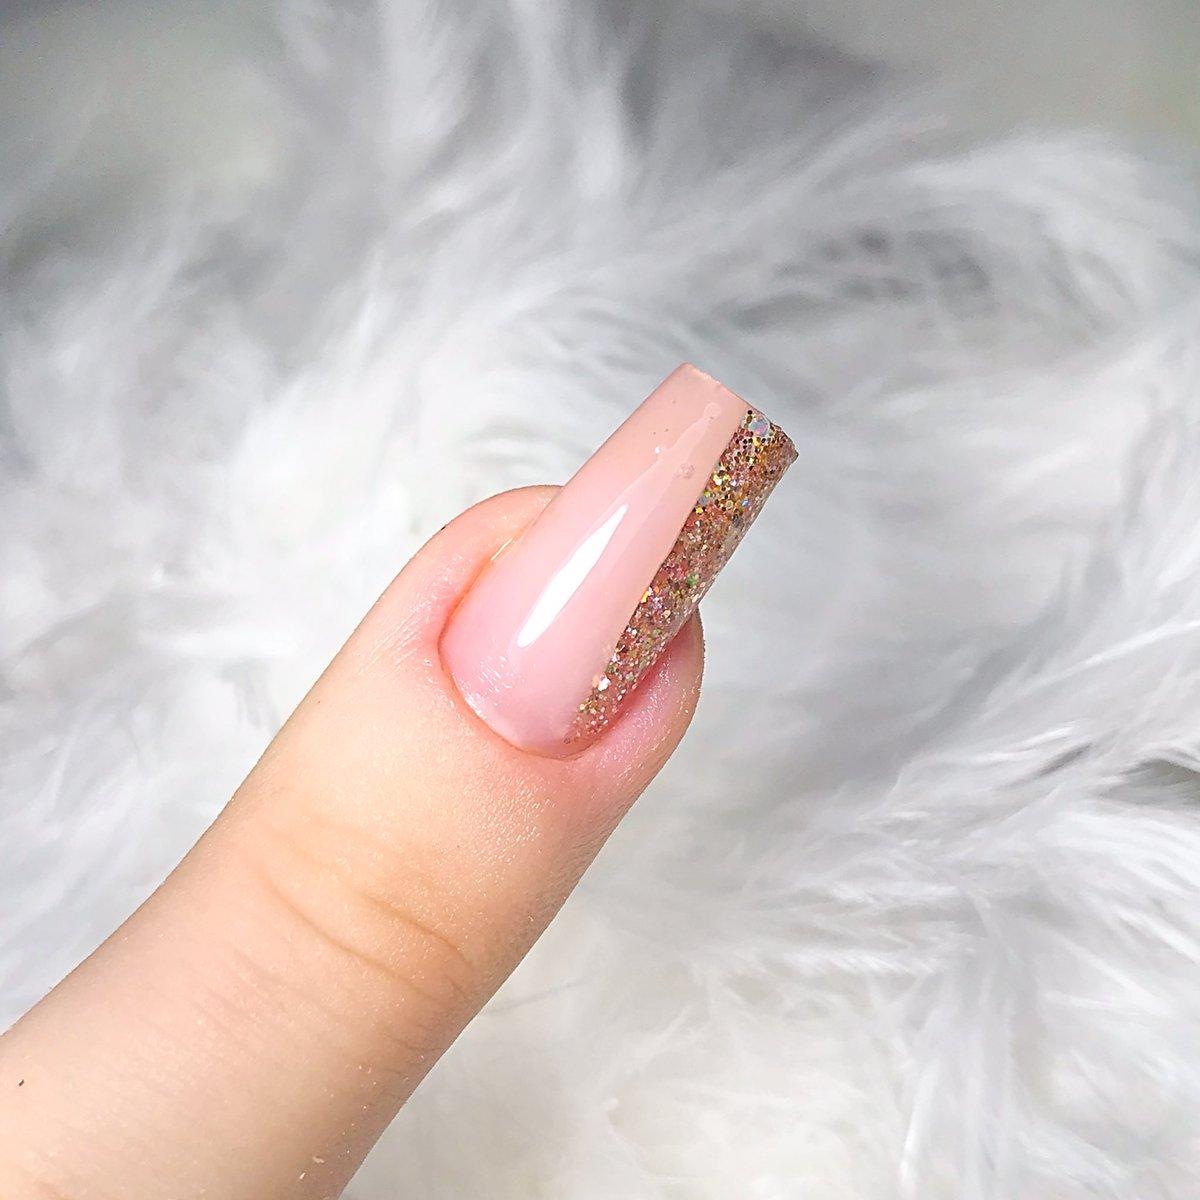 Namoral, sou mto boa meixmo nas unhas  . #fiberglass #fiber #fibradevidro #unhasemgel #nailspic.twitter.com/DpBIBU7JXl